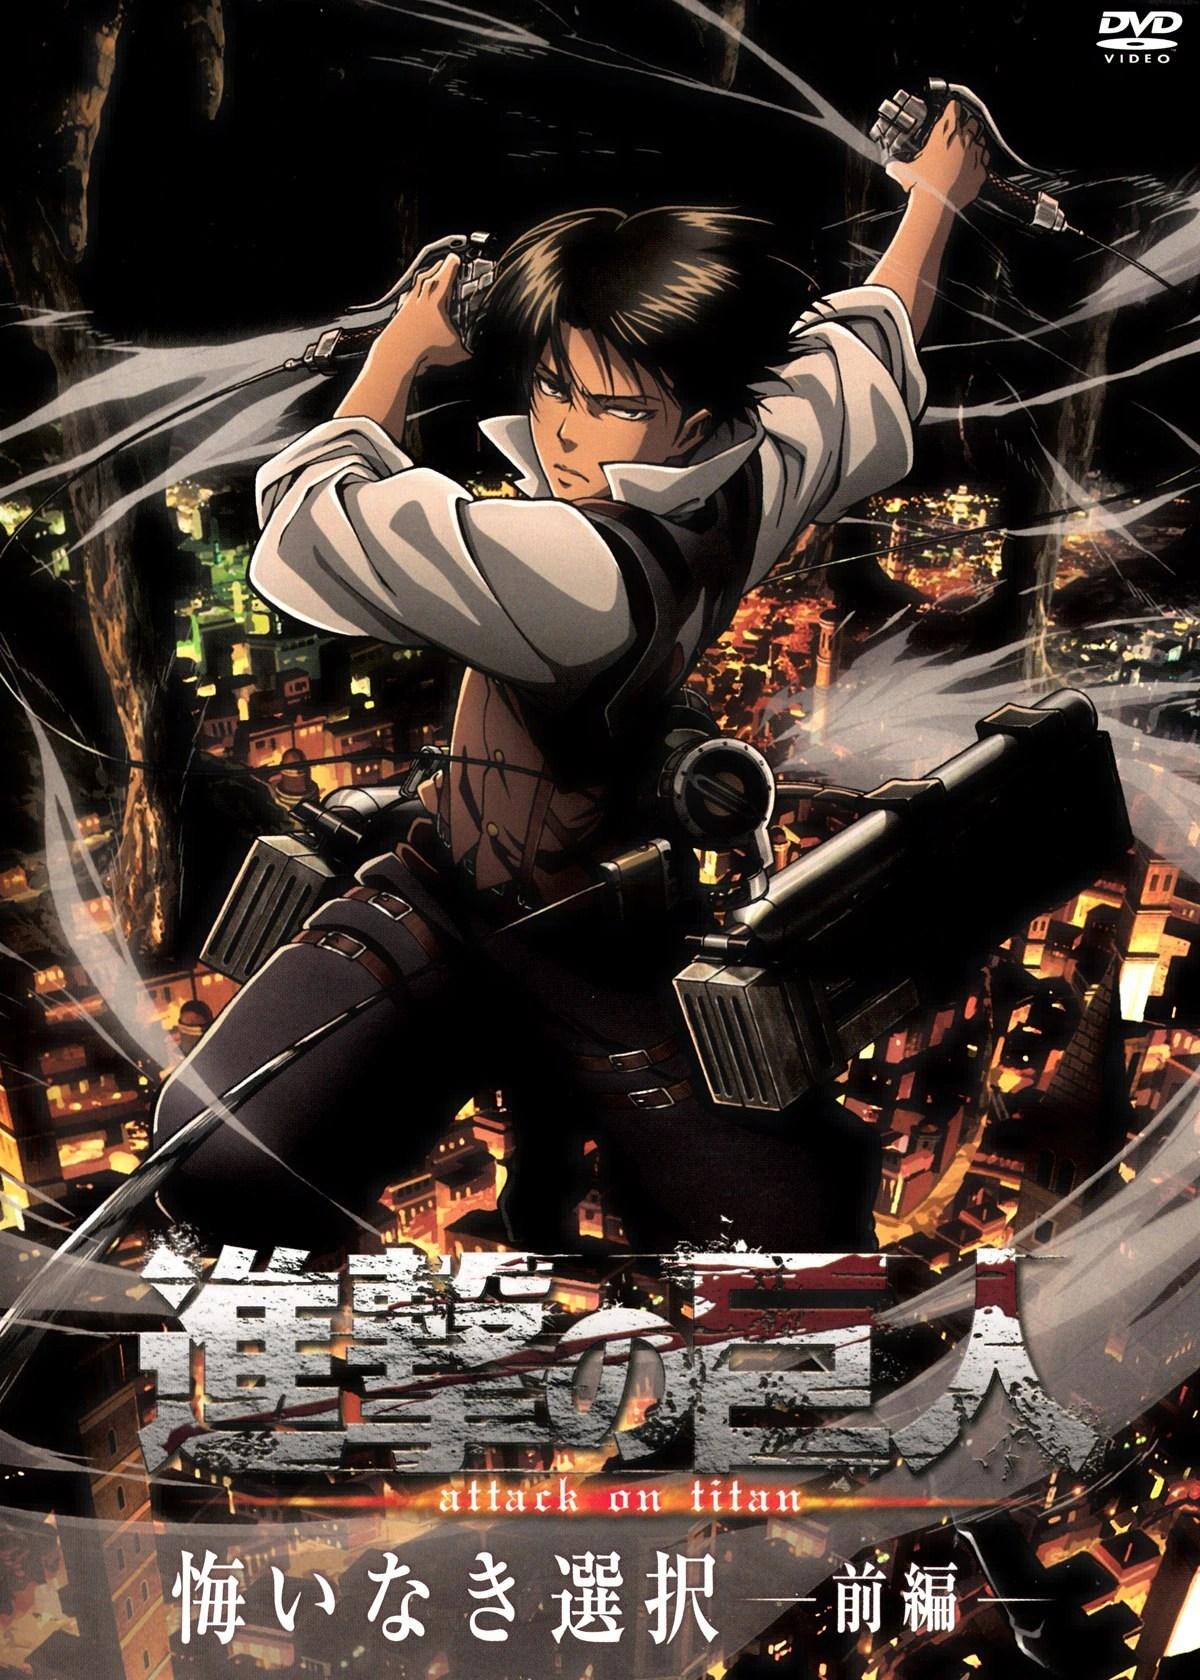 Farlan Levi Attack On Titan Manga - Year of Clean Water